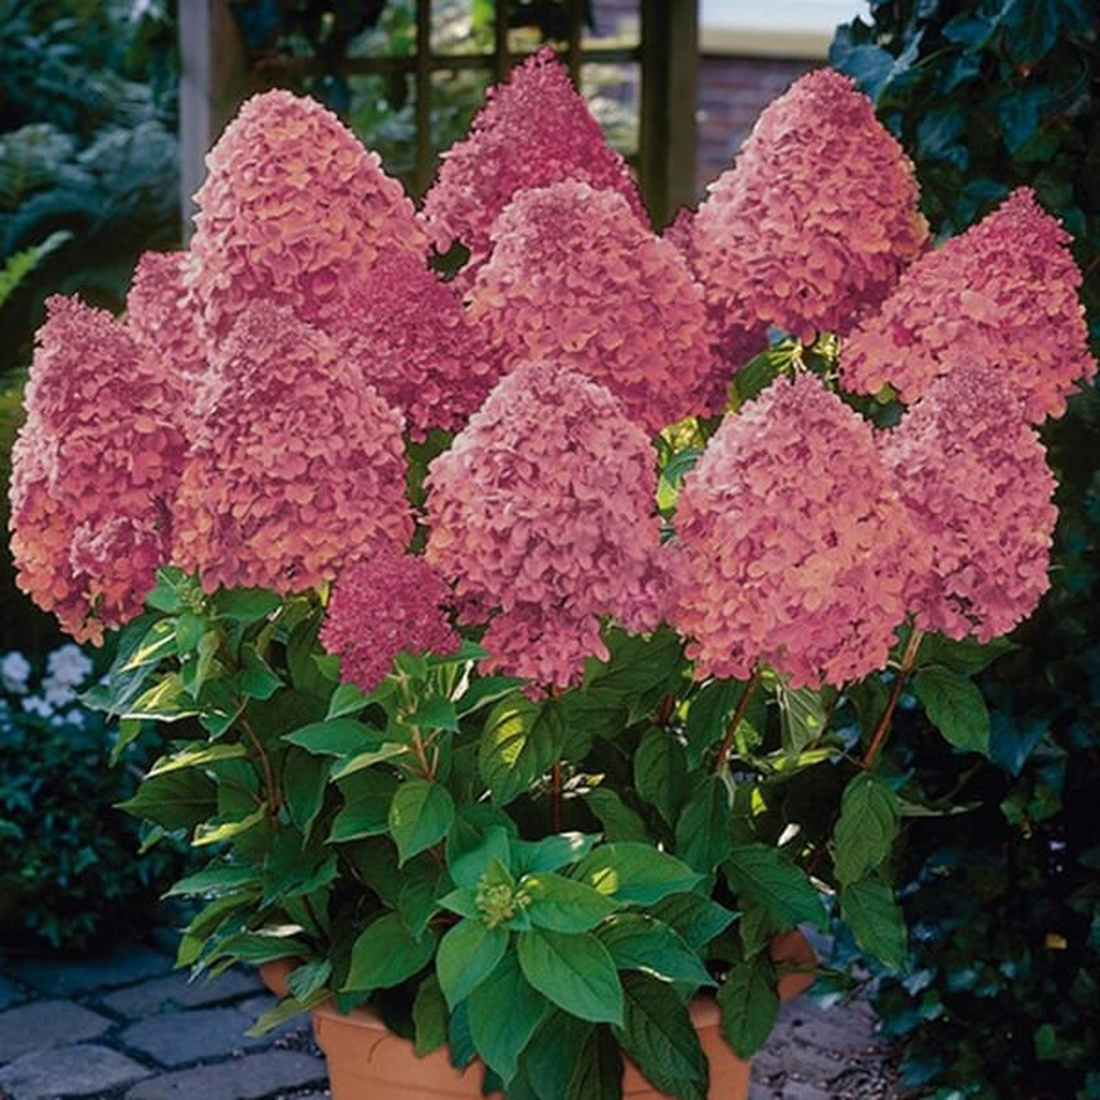 Гортензия метельчатая 'Sundae Fraise', Hydrangea paniculata 'Sundae Fraise'